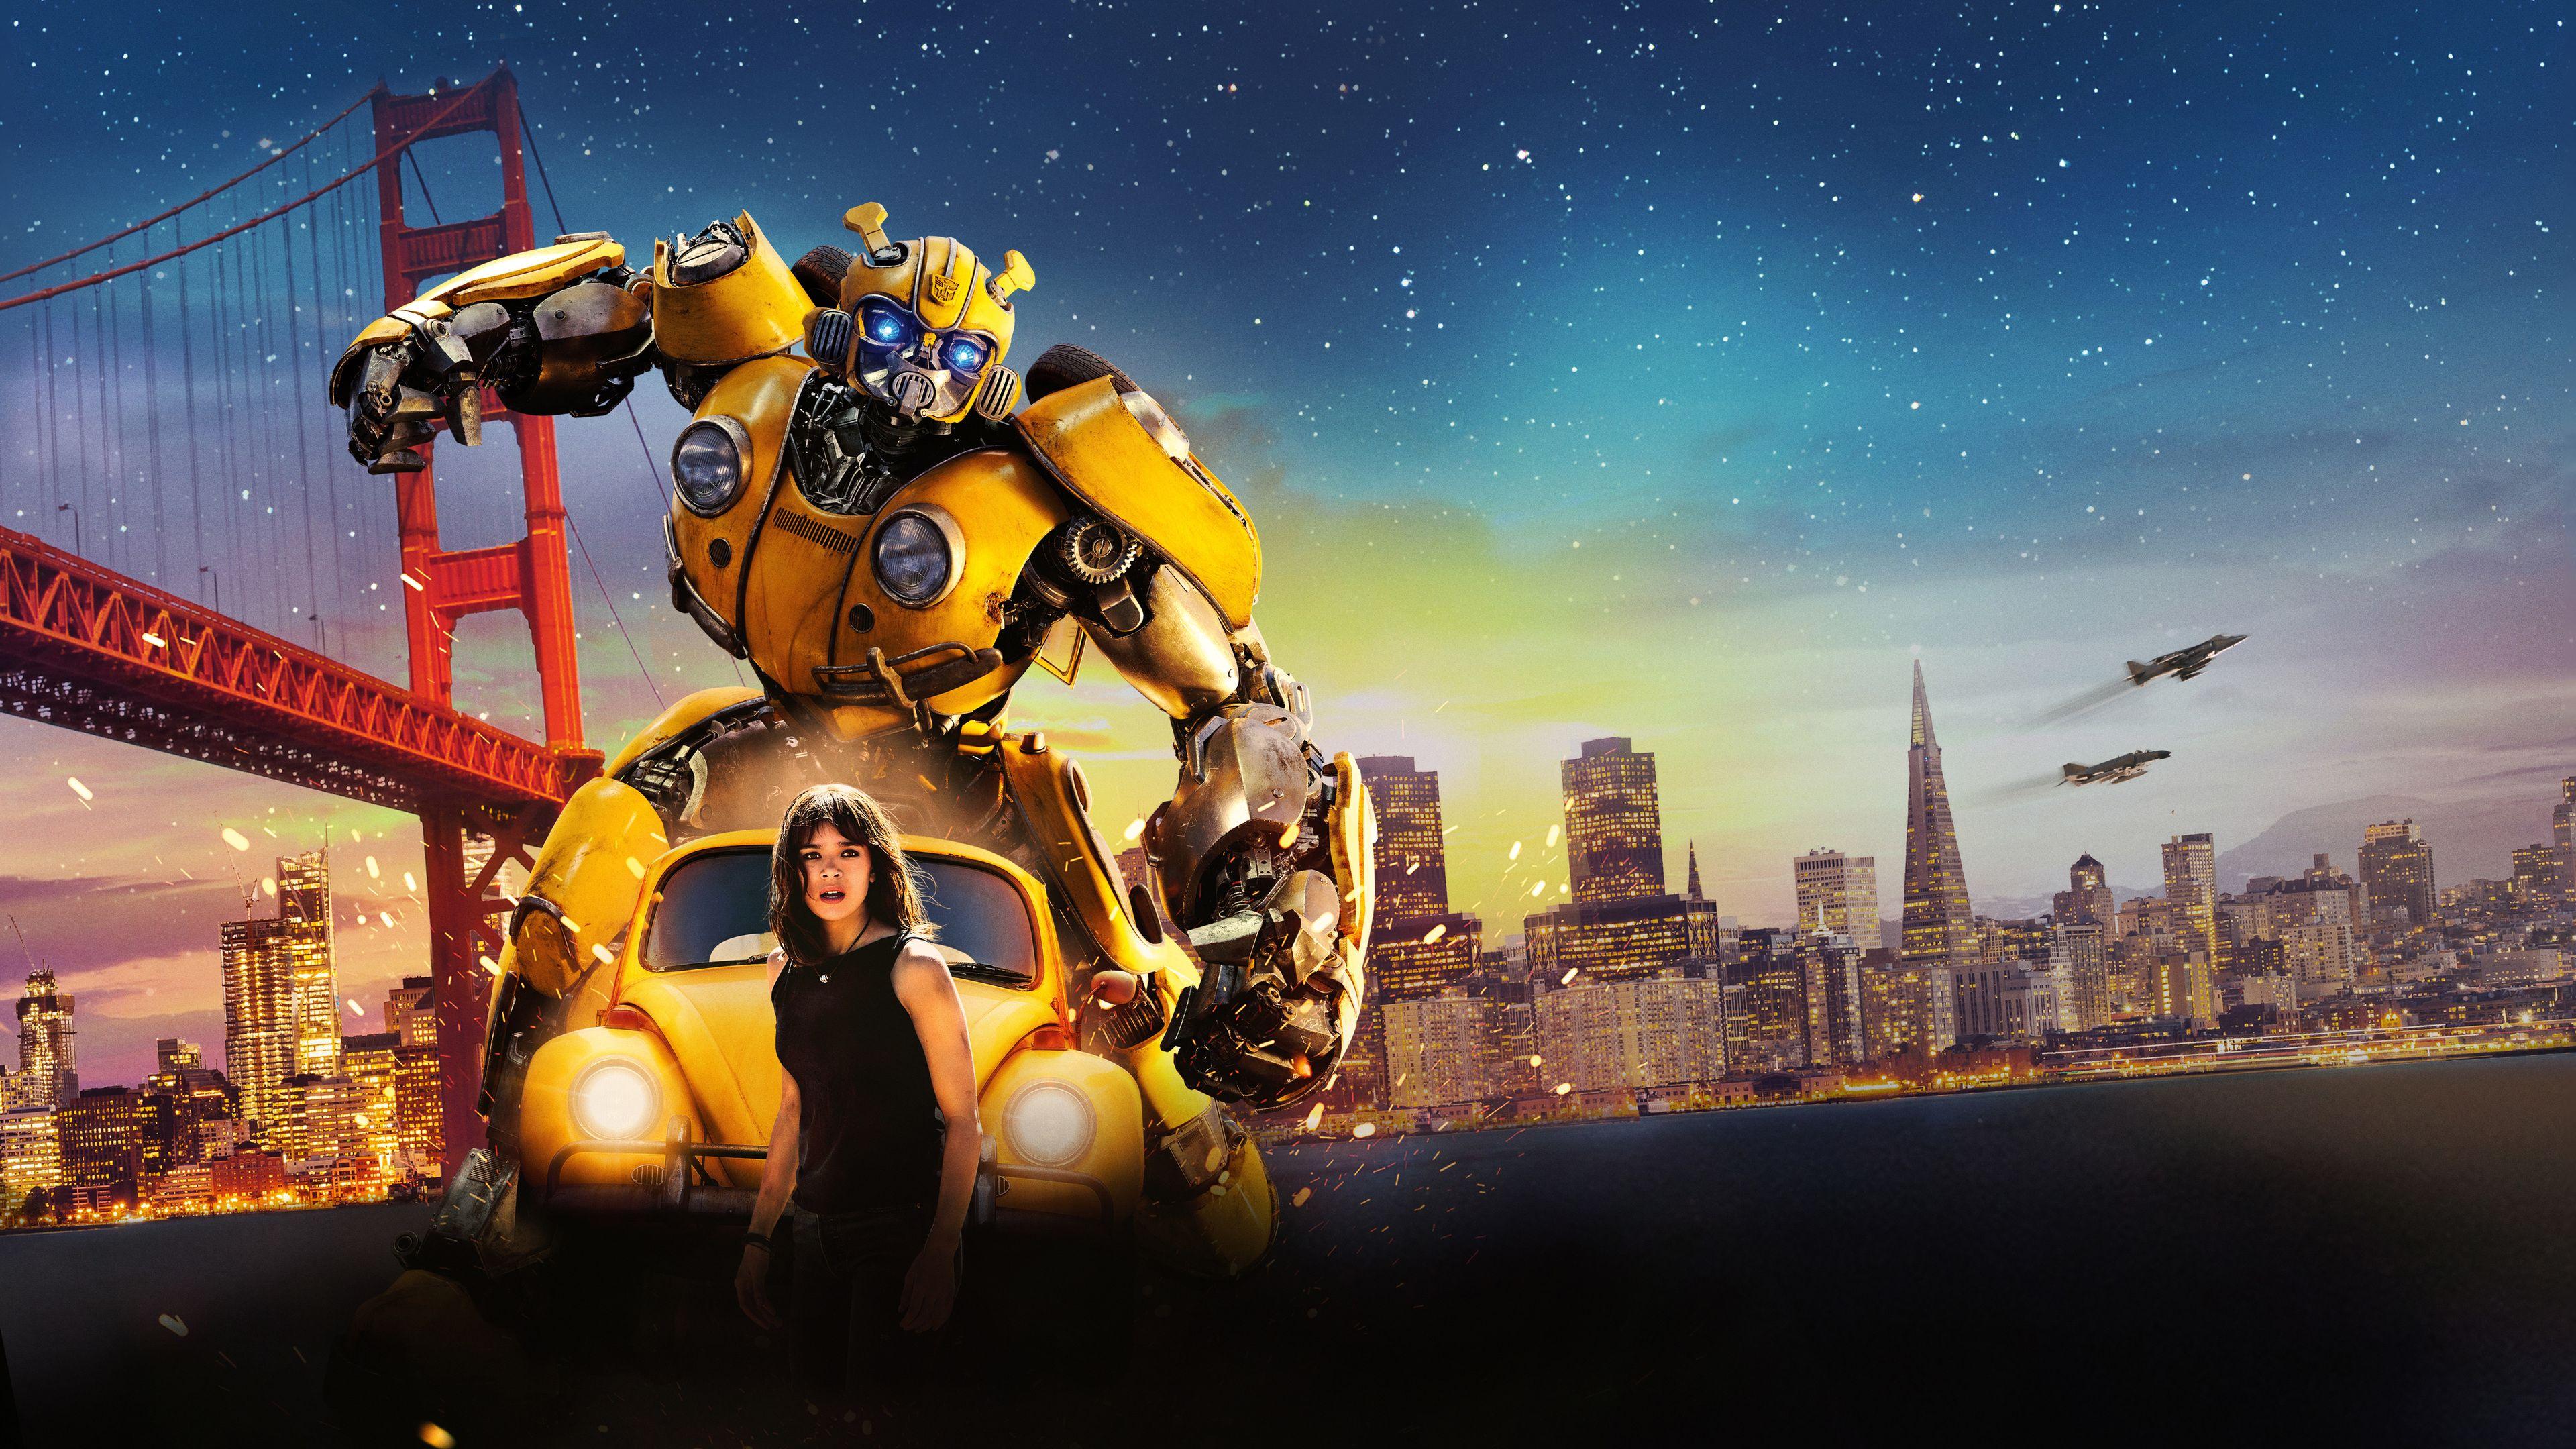 Bumblebee Movie 4k Movies Wallpapers Hd Wallpapers Bumblebee Wallpapers 4k Wallpapers 2018 Movies Wallpapers Movie Wallpapers Hd Wallpaper Go Wallpaper